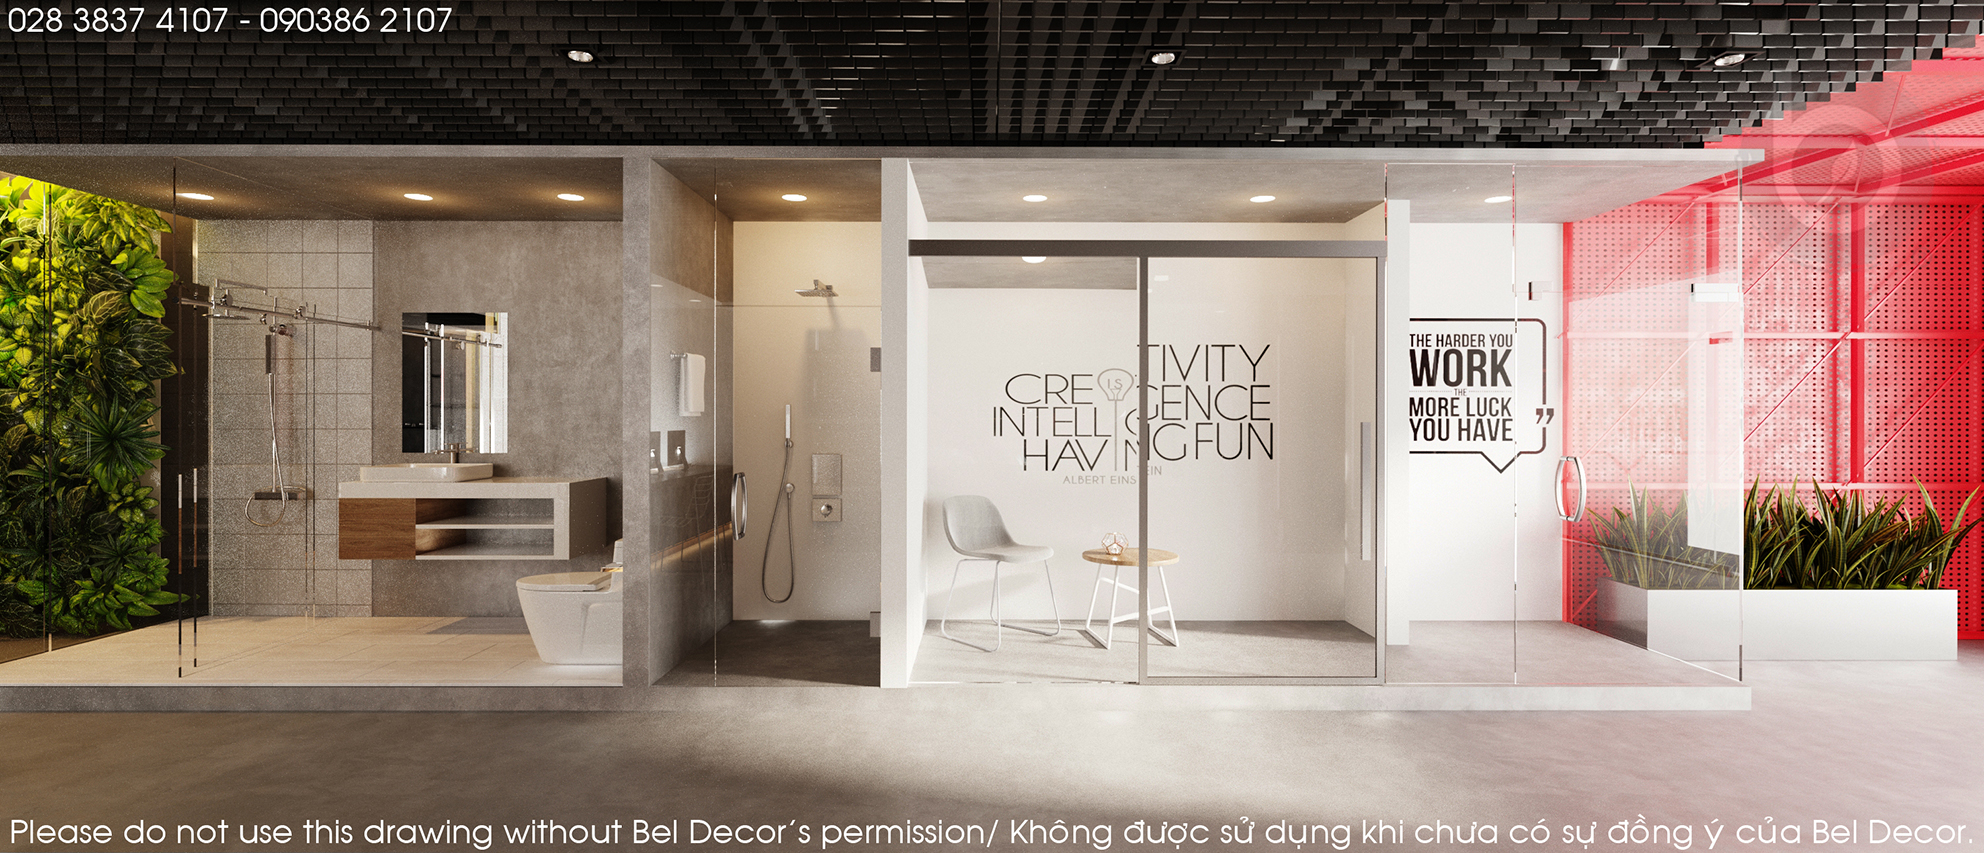 thiết kế nội thất Showroom tại Hồ Chí Minh Thiết kế nội thất Showroom (SH1801) 8 1538388012